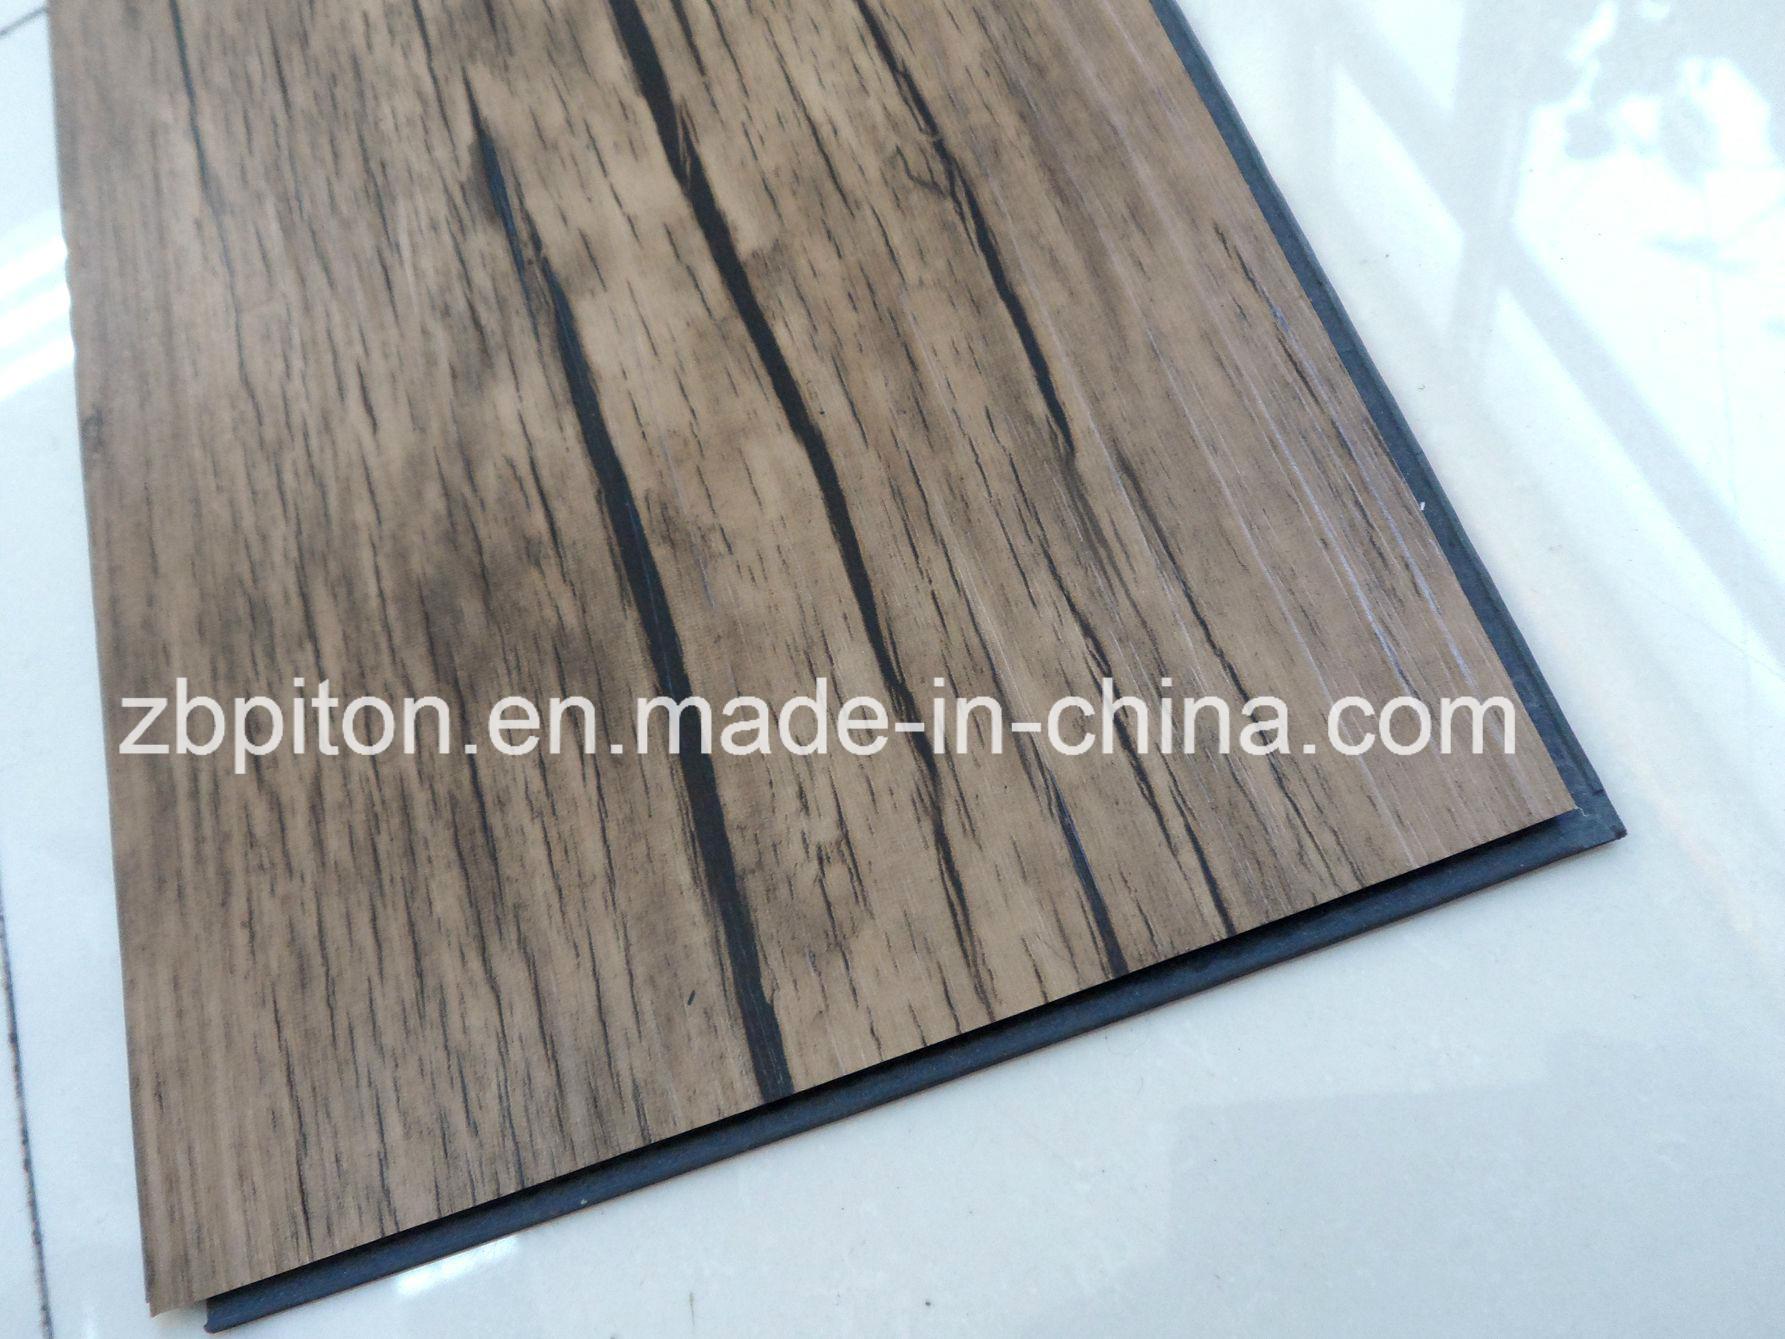 China click system pvc vinyl flooring tile interlocking sheet click system pvc vinyl flooring tile interlocking sheet cng0310n doublecrazyfo Gallery